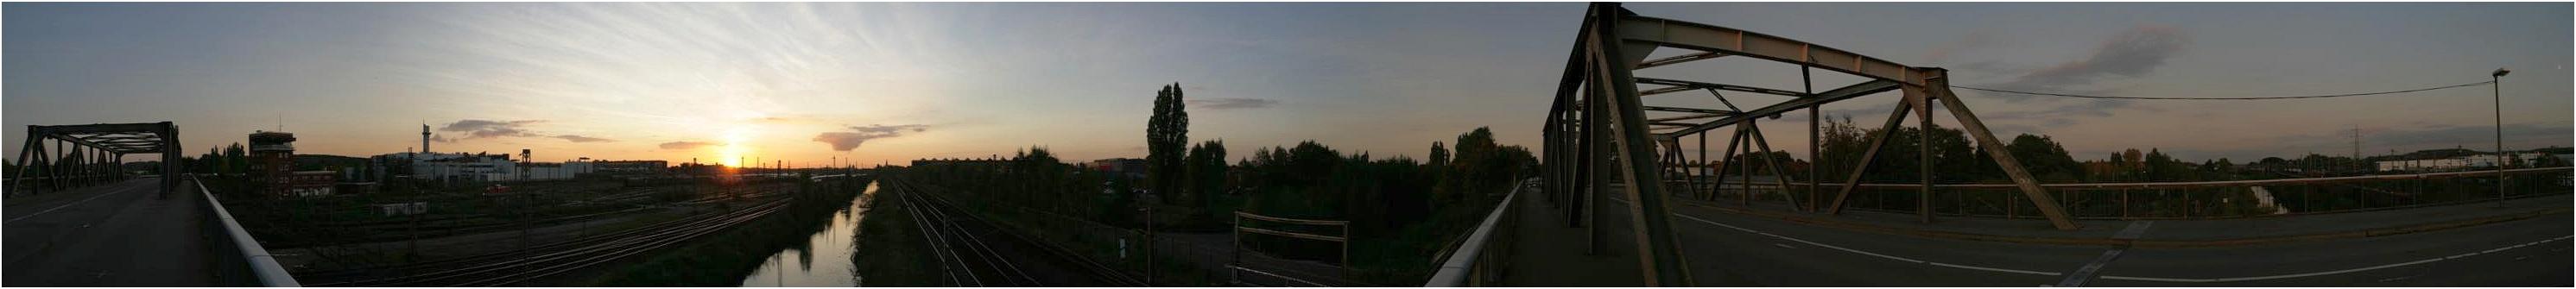 Güterbahnhof bei Sonnenuntergang